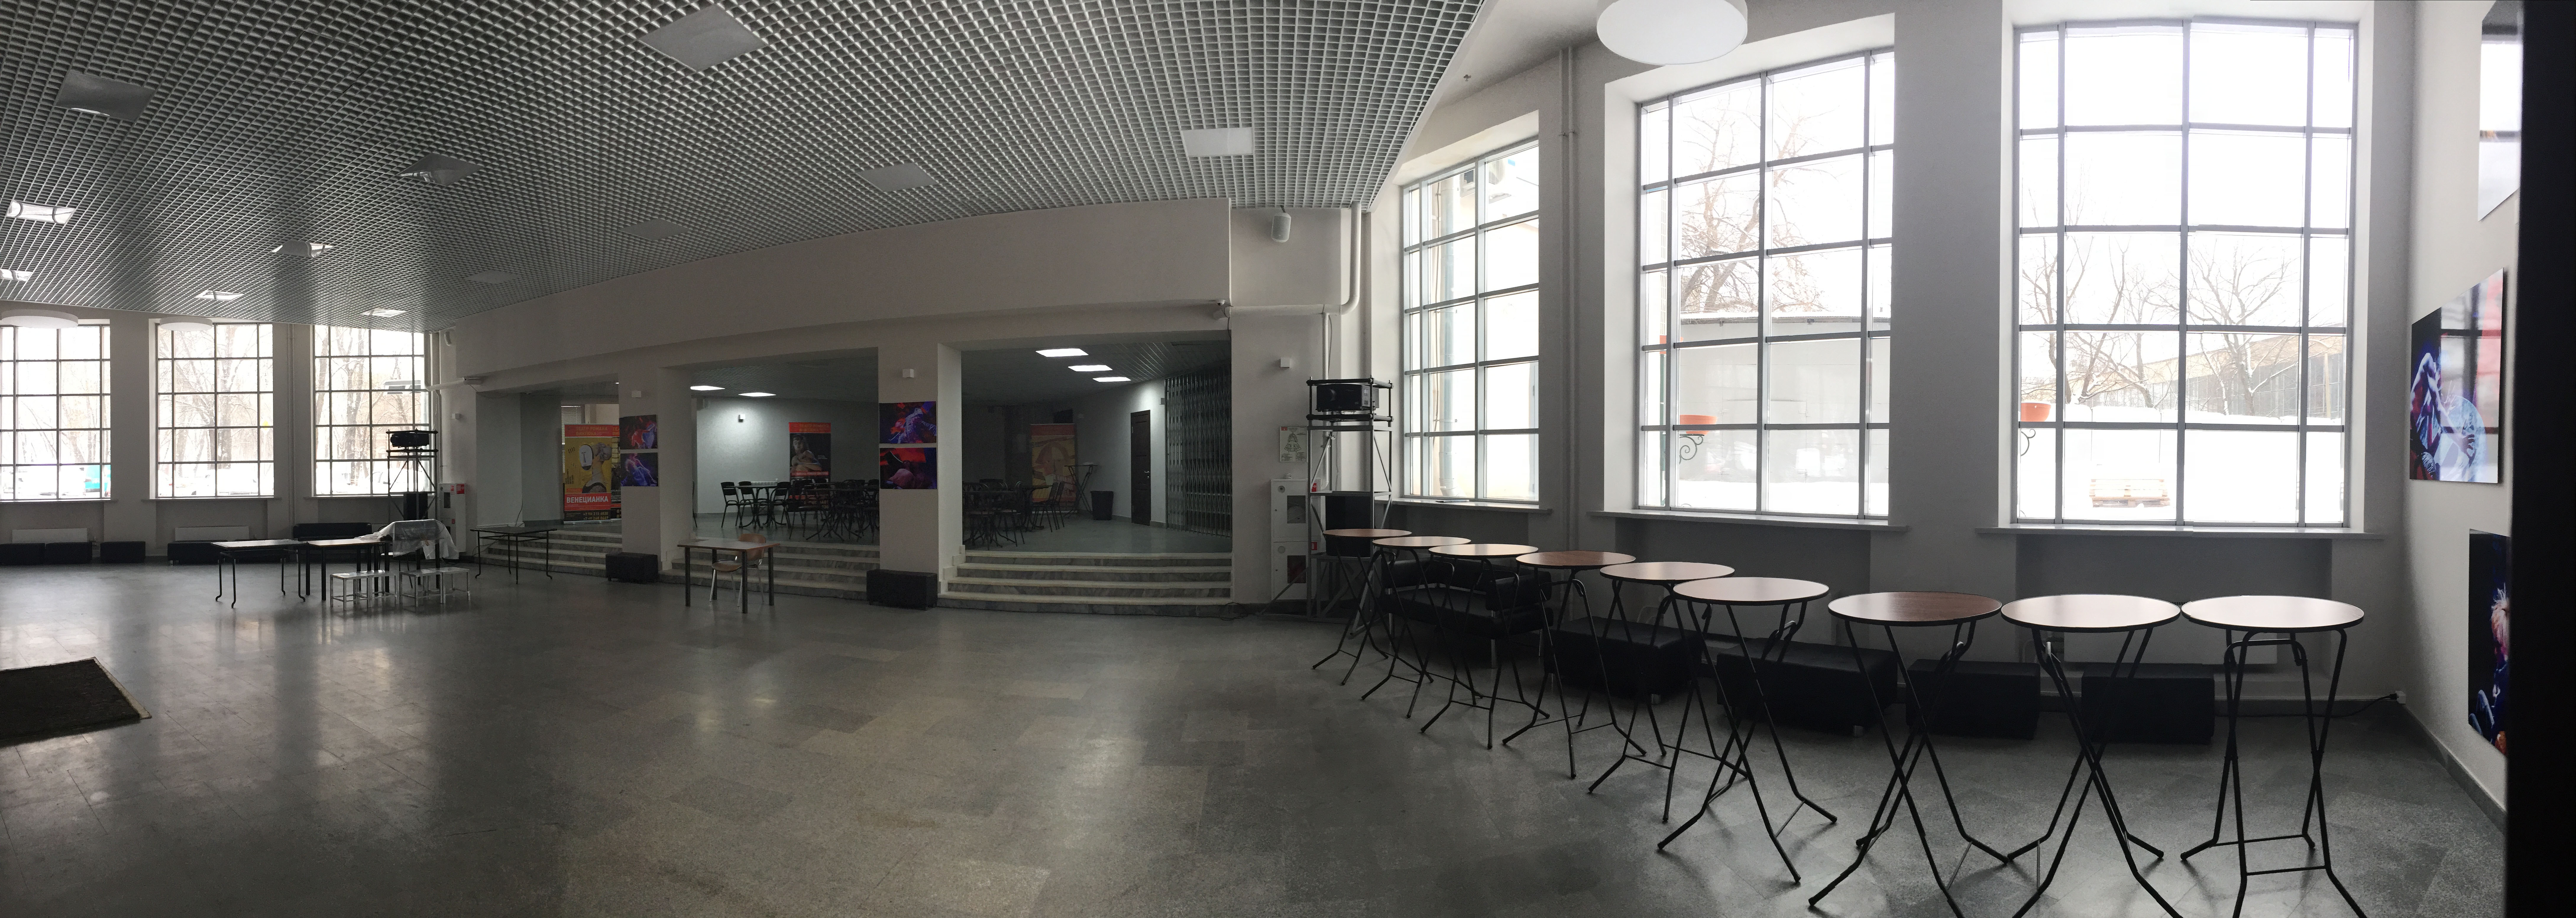 Театр виктюка схема зала фото